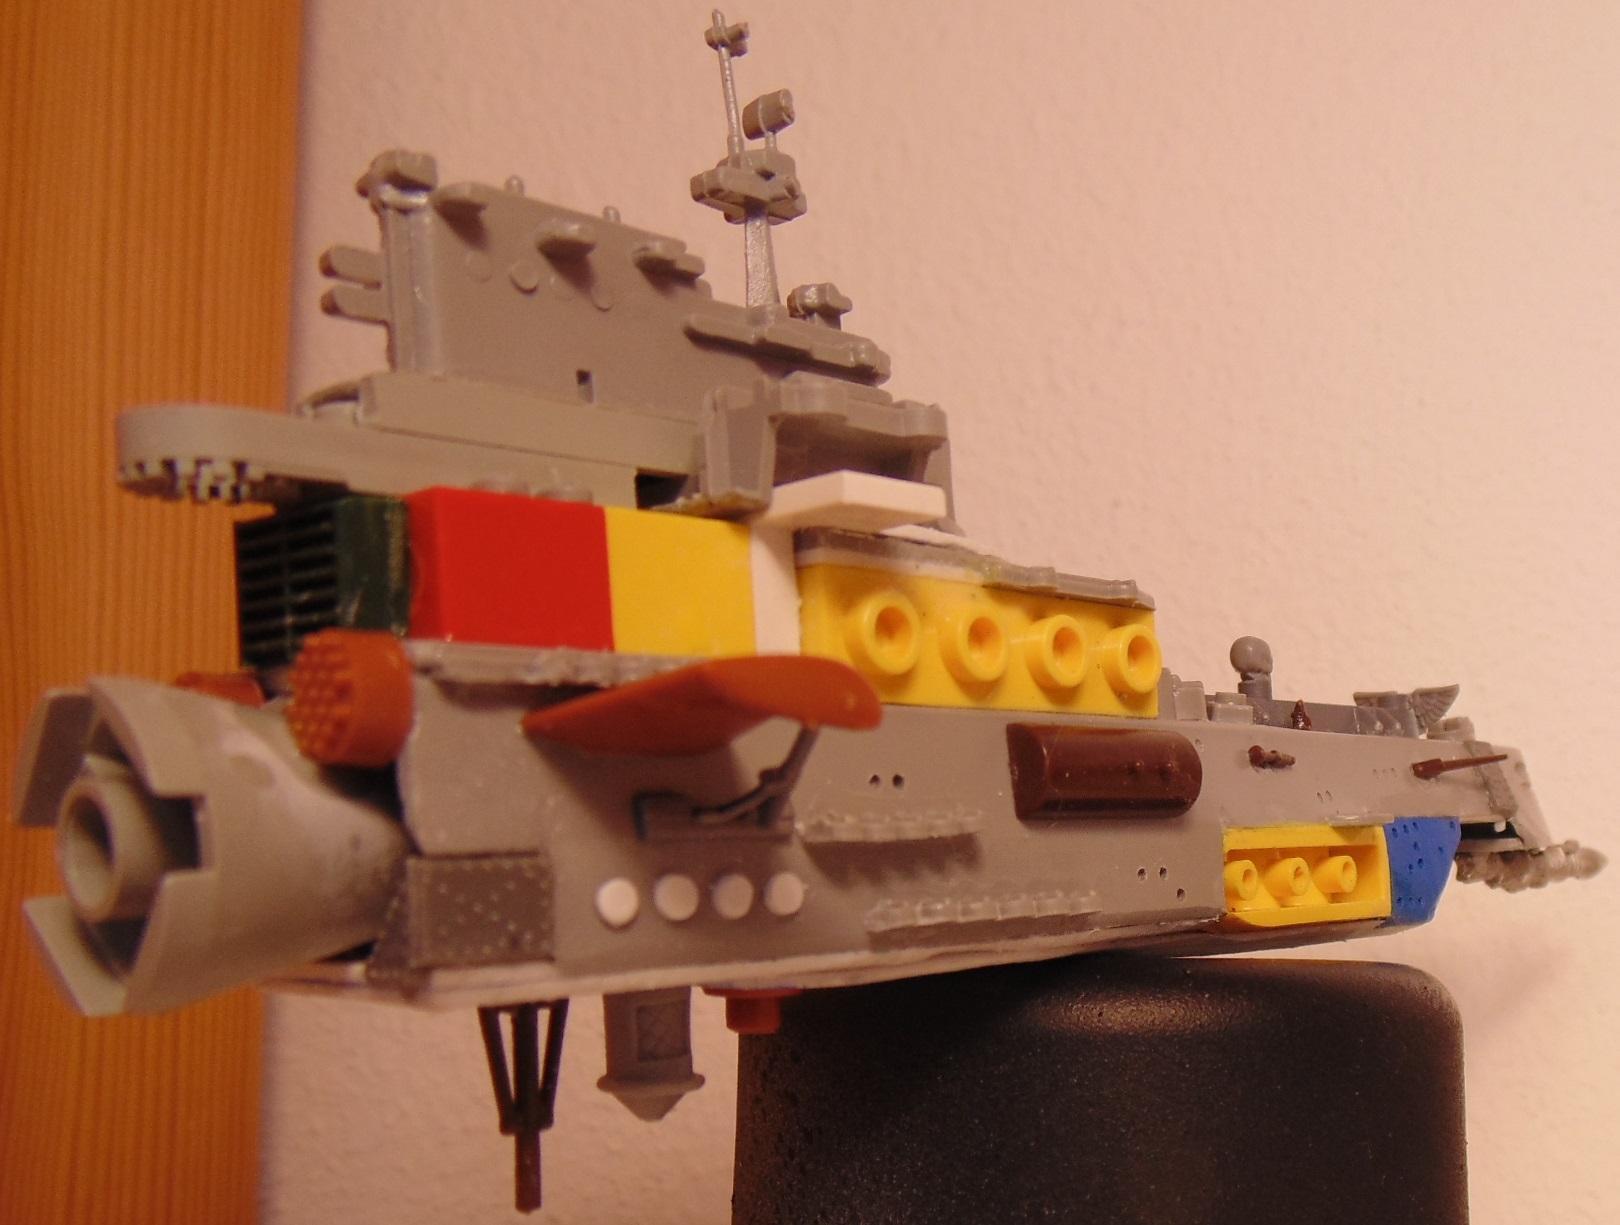 Battlefleet, Battleship, Conversion, Cruiser, Drone, Escort, Fleet, Gothic, Gotic, Hive, Imperial, Kraken, Mothership, Scratch, Scratch Build, Ship, Ships, Tyranids, Vanguard